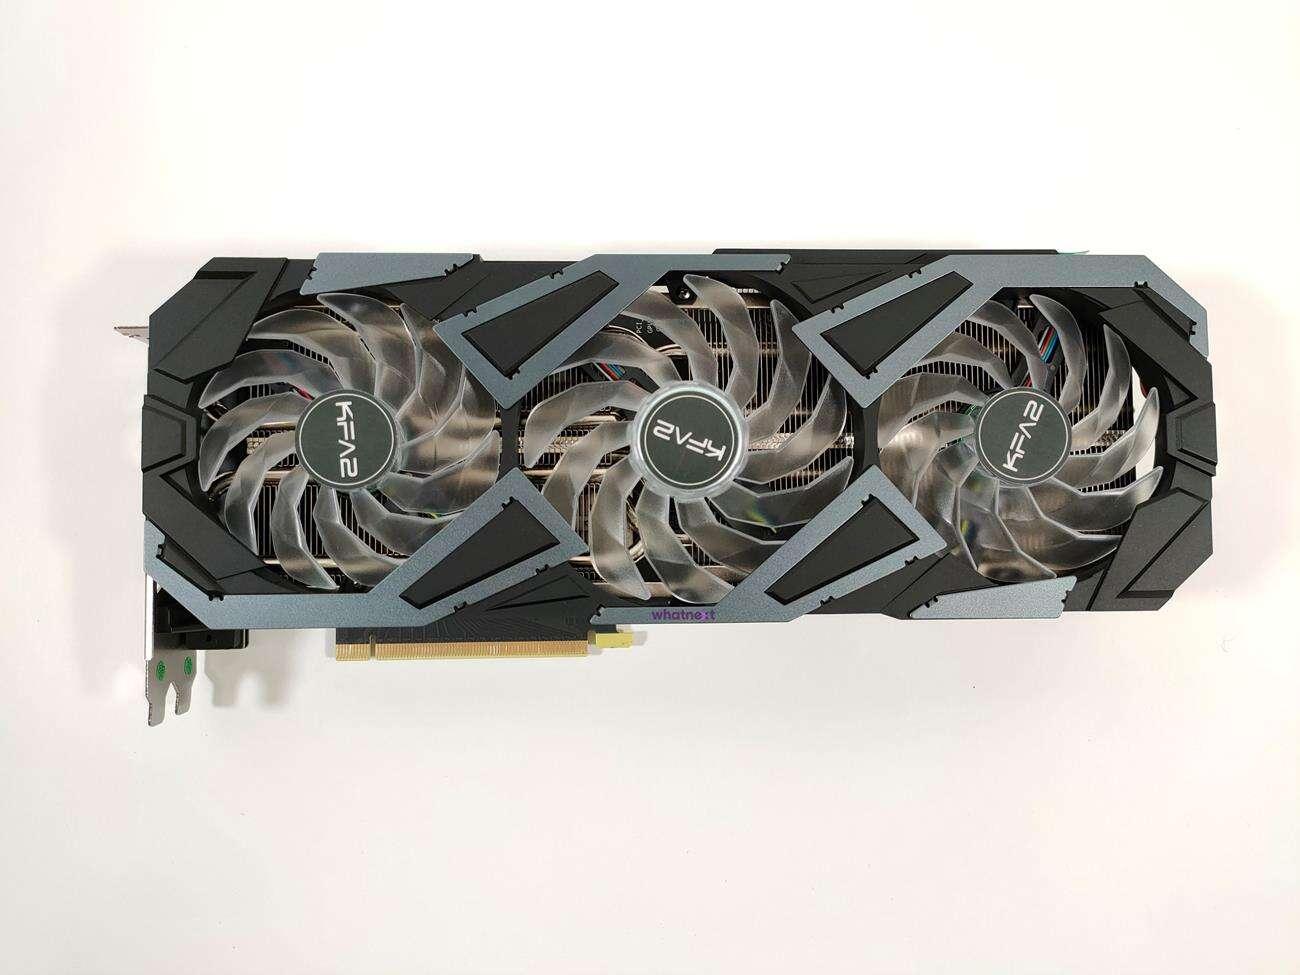 test KFA2 GeForce RTX 3070 EX Gamer (1-Click OC), recenzja KFA2 GeForce RTX 3070 EX Gamer (1-Click OC), opinia KFA2 GeForce RTX 3070 EX Gamer (1-Click OC)